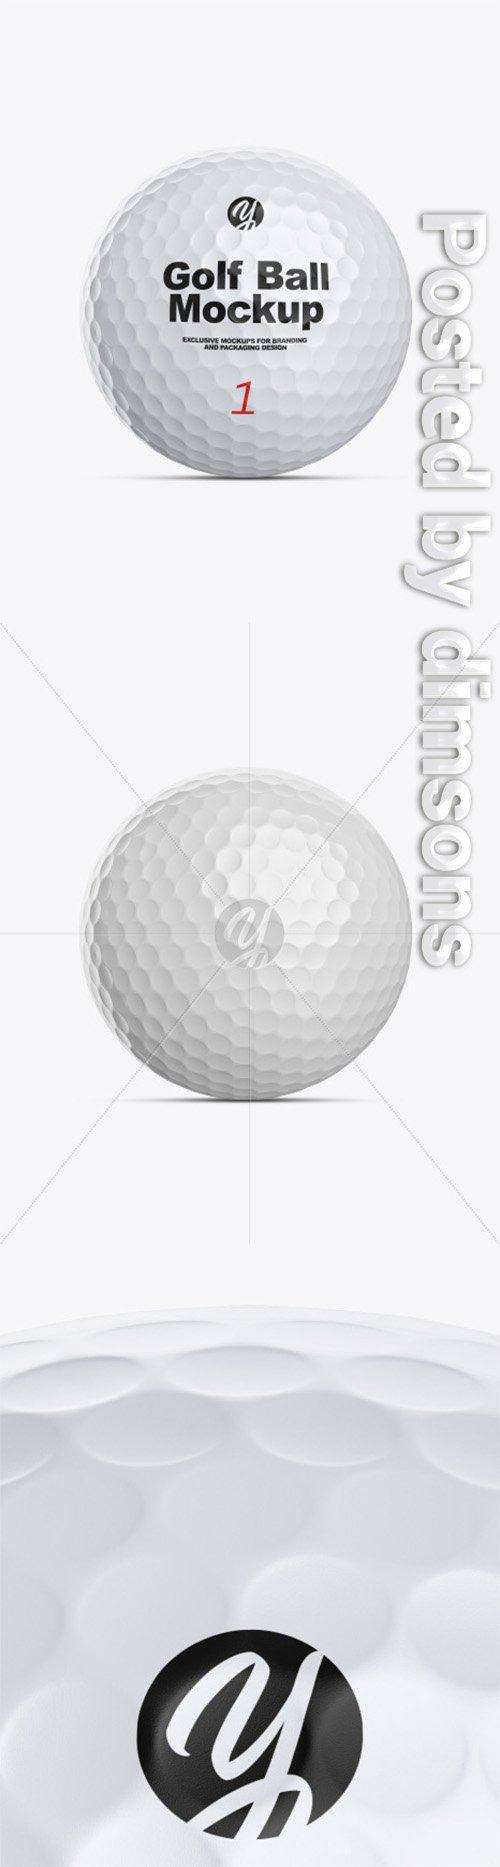 Golf Ball Mockup 48329 TIF